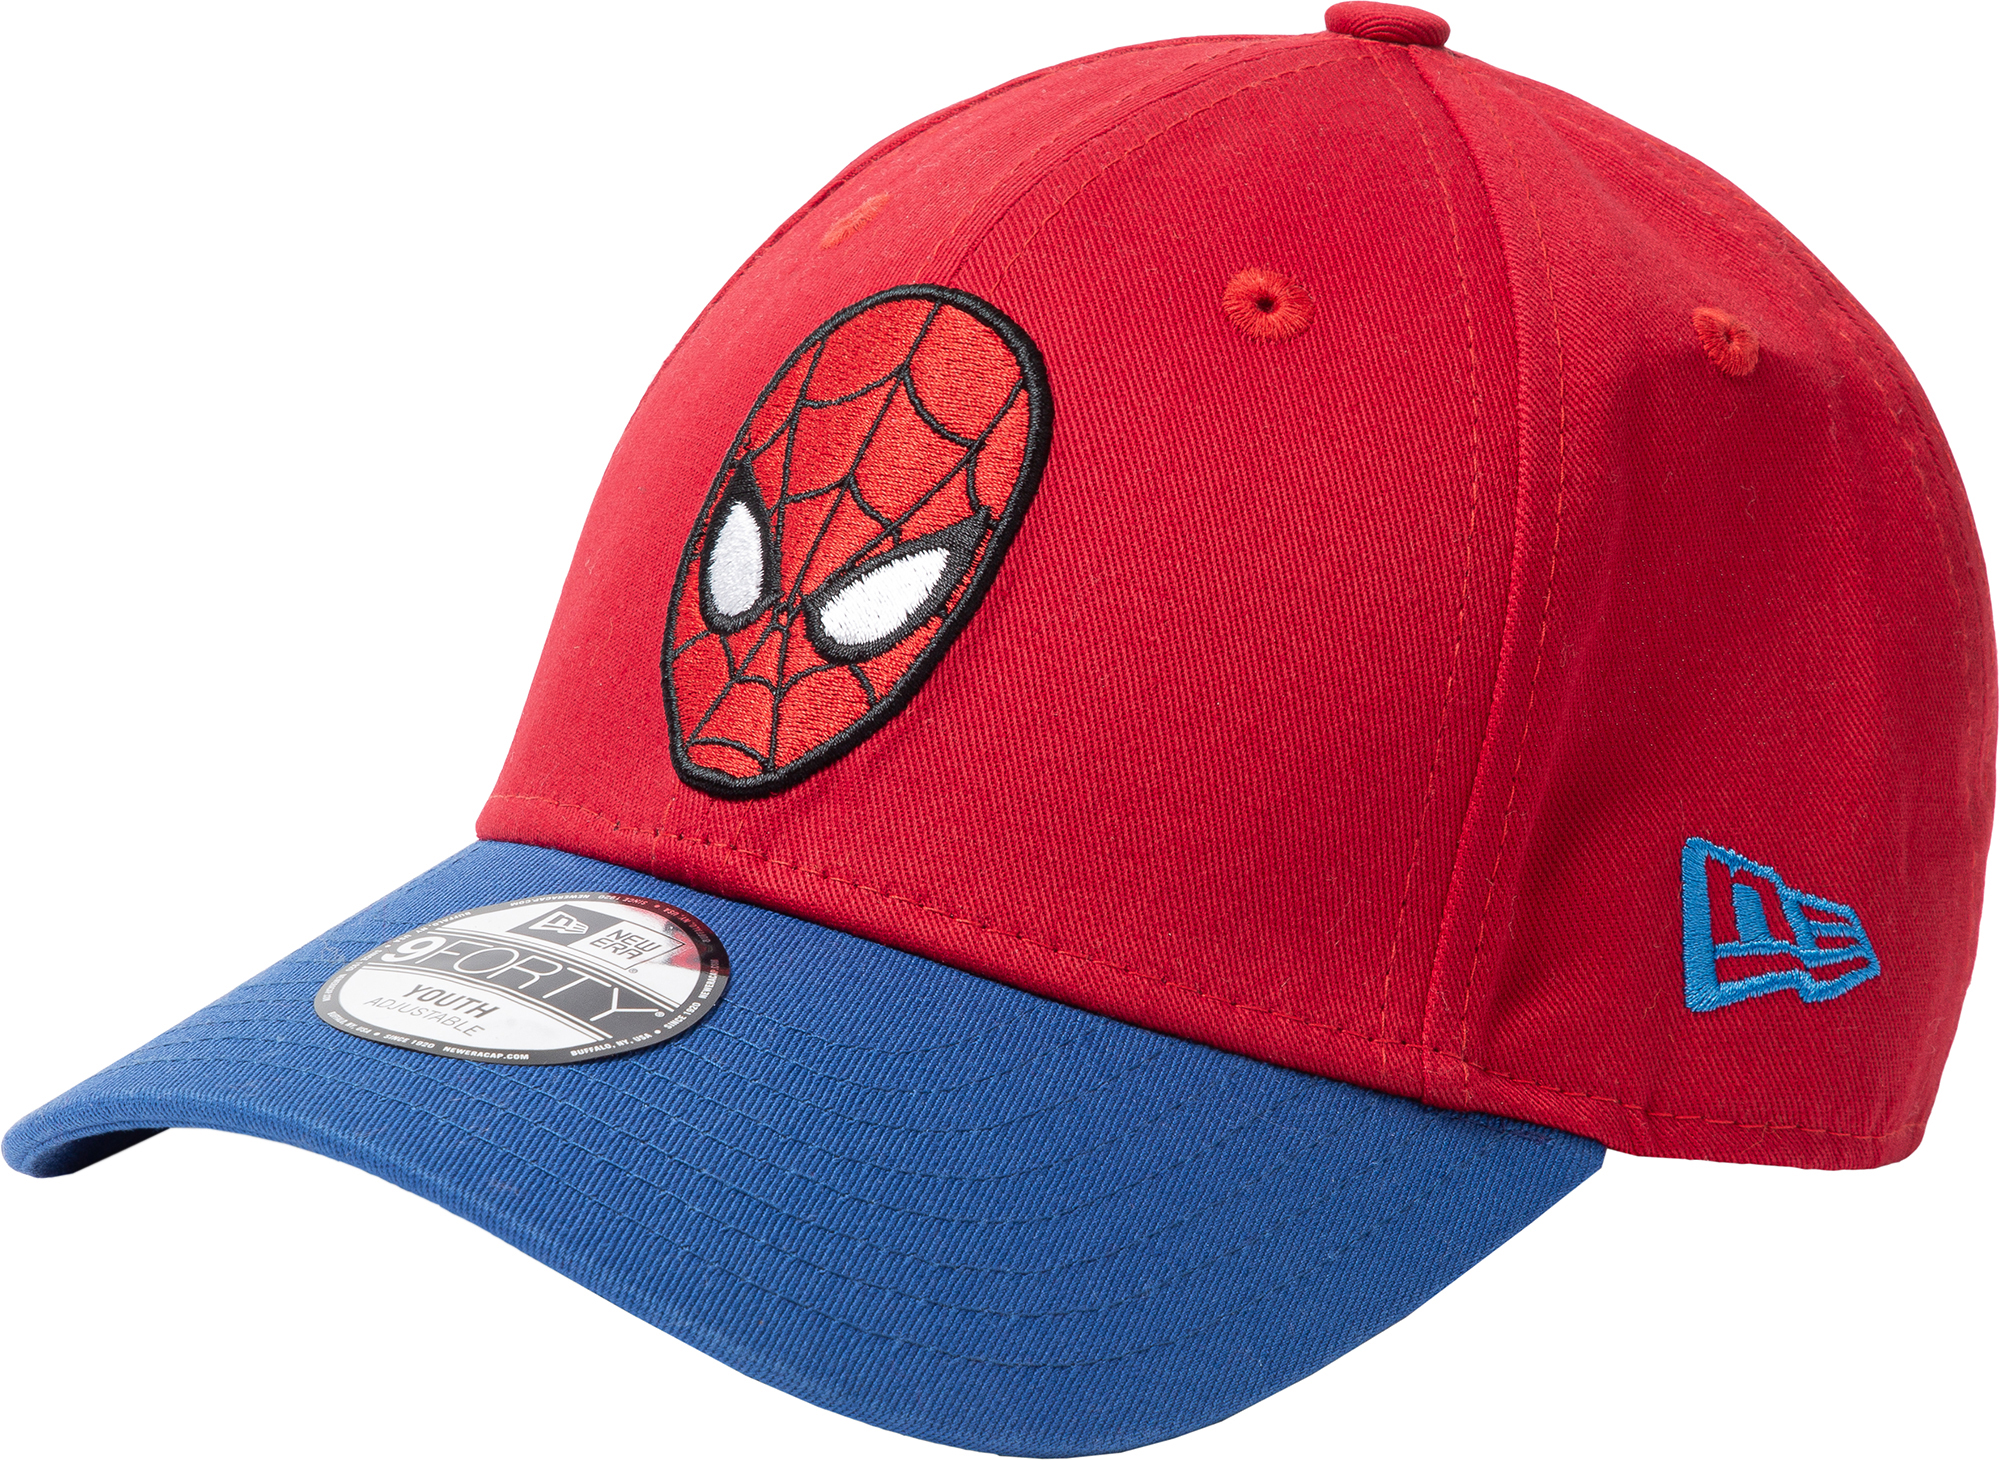 New Era Бейсболка для мальчиков New Era Character 940, размер 54-55 new era шапка для мальчиков new era ne cuff pom размер 54 55